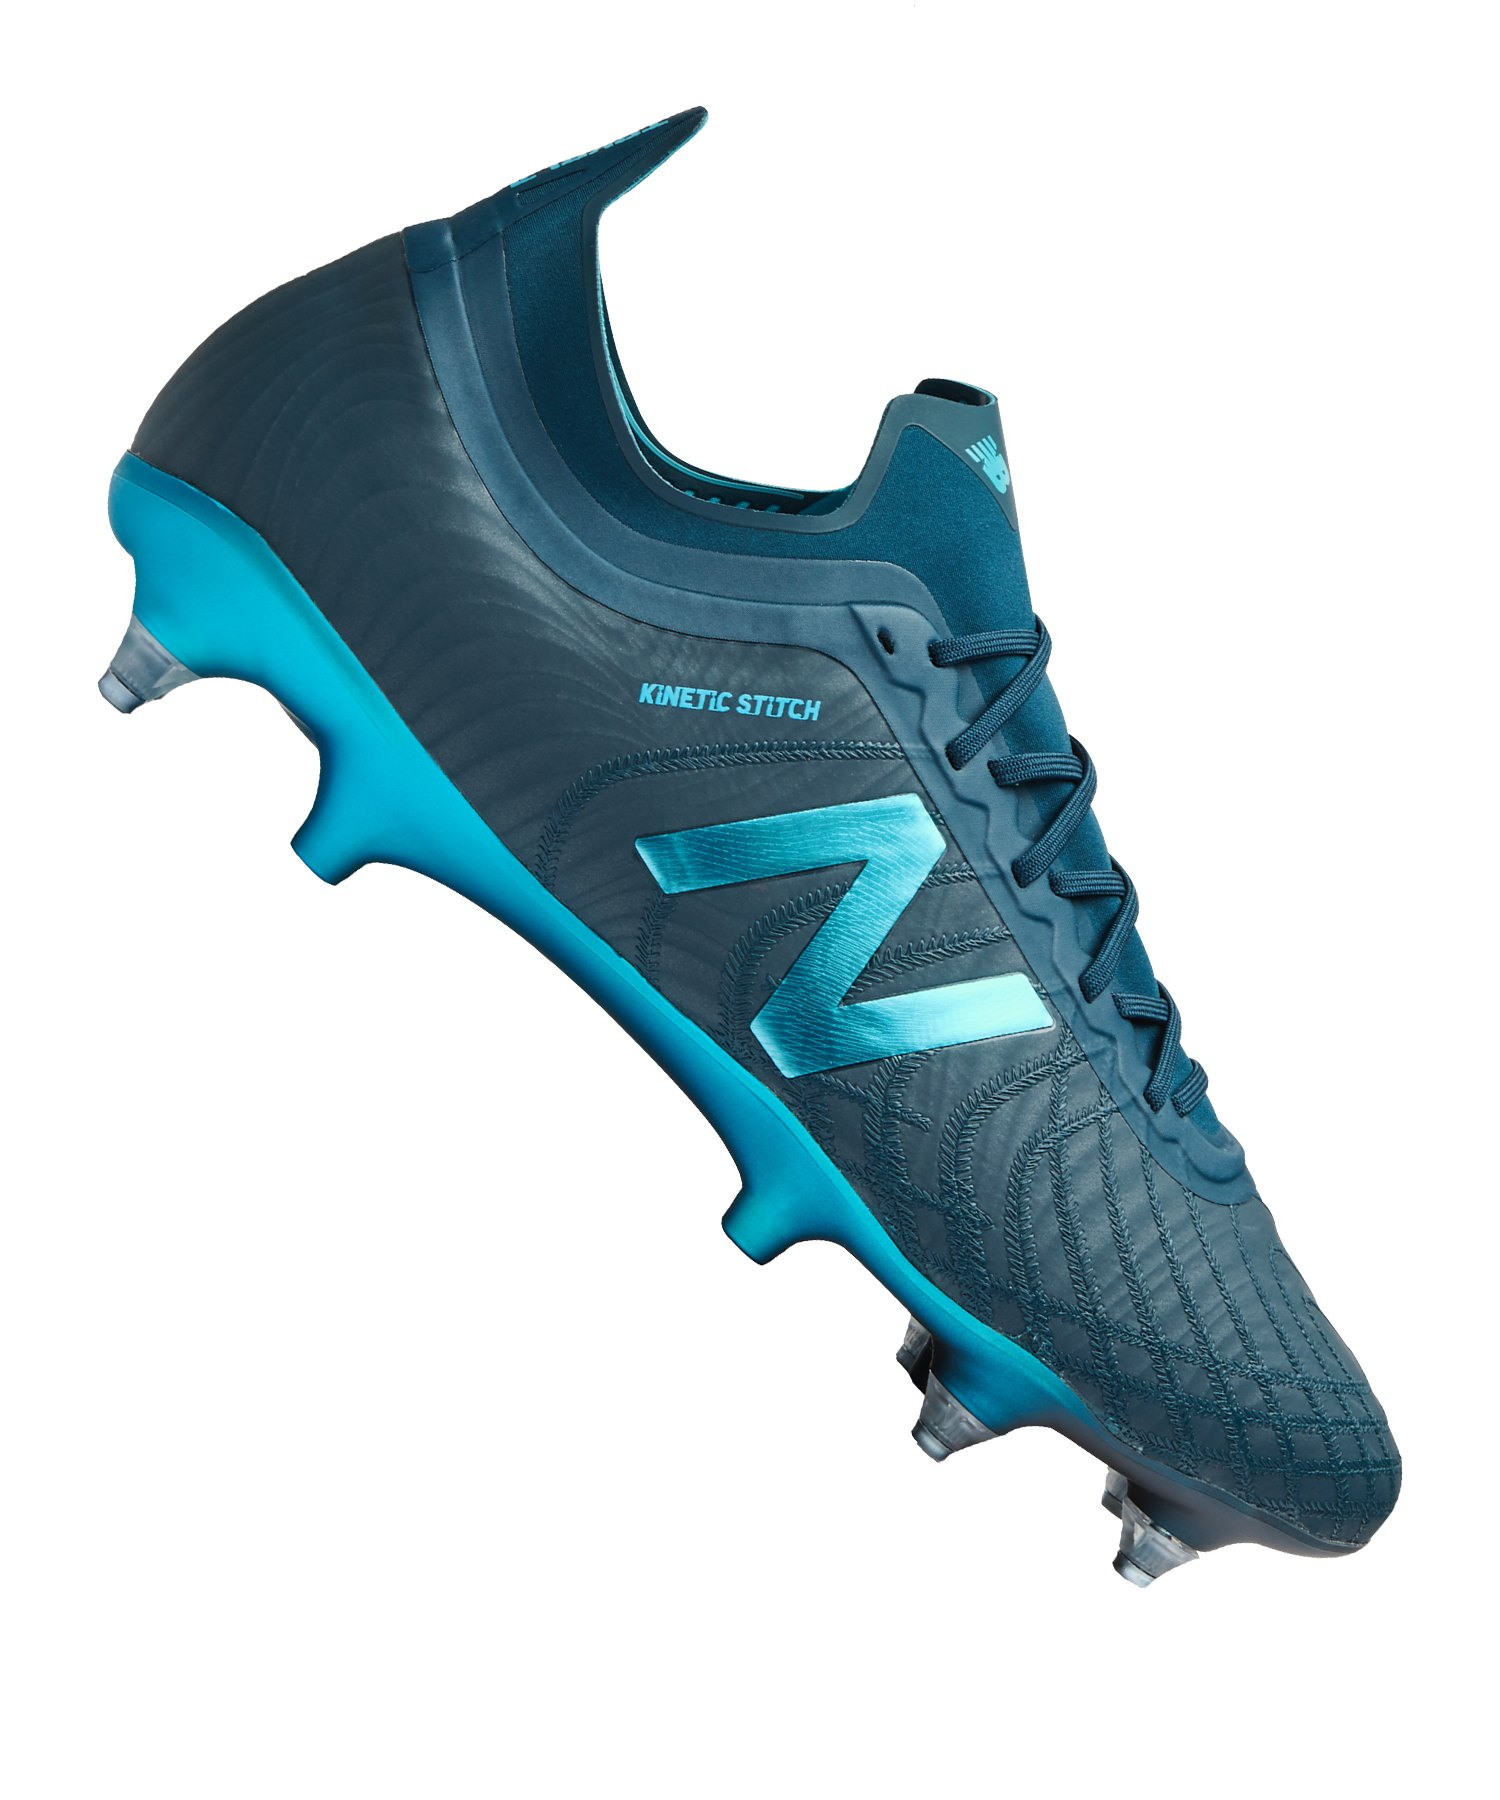 New Balance Tekela Pro SG Blau F5 - blau